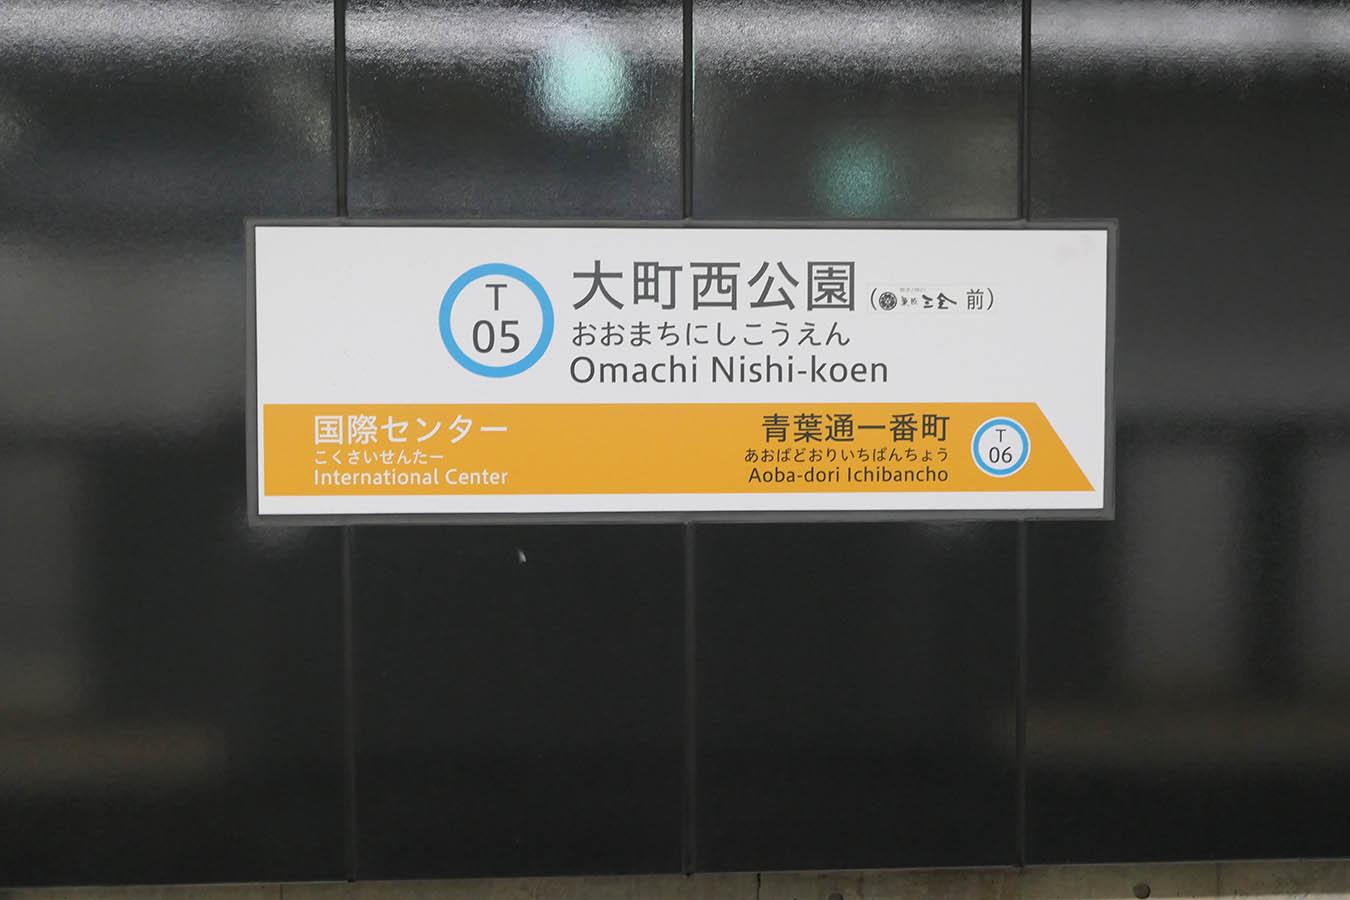 ss-t05_photo03.jpg